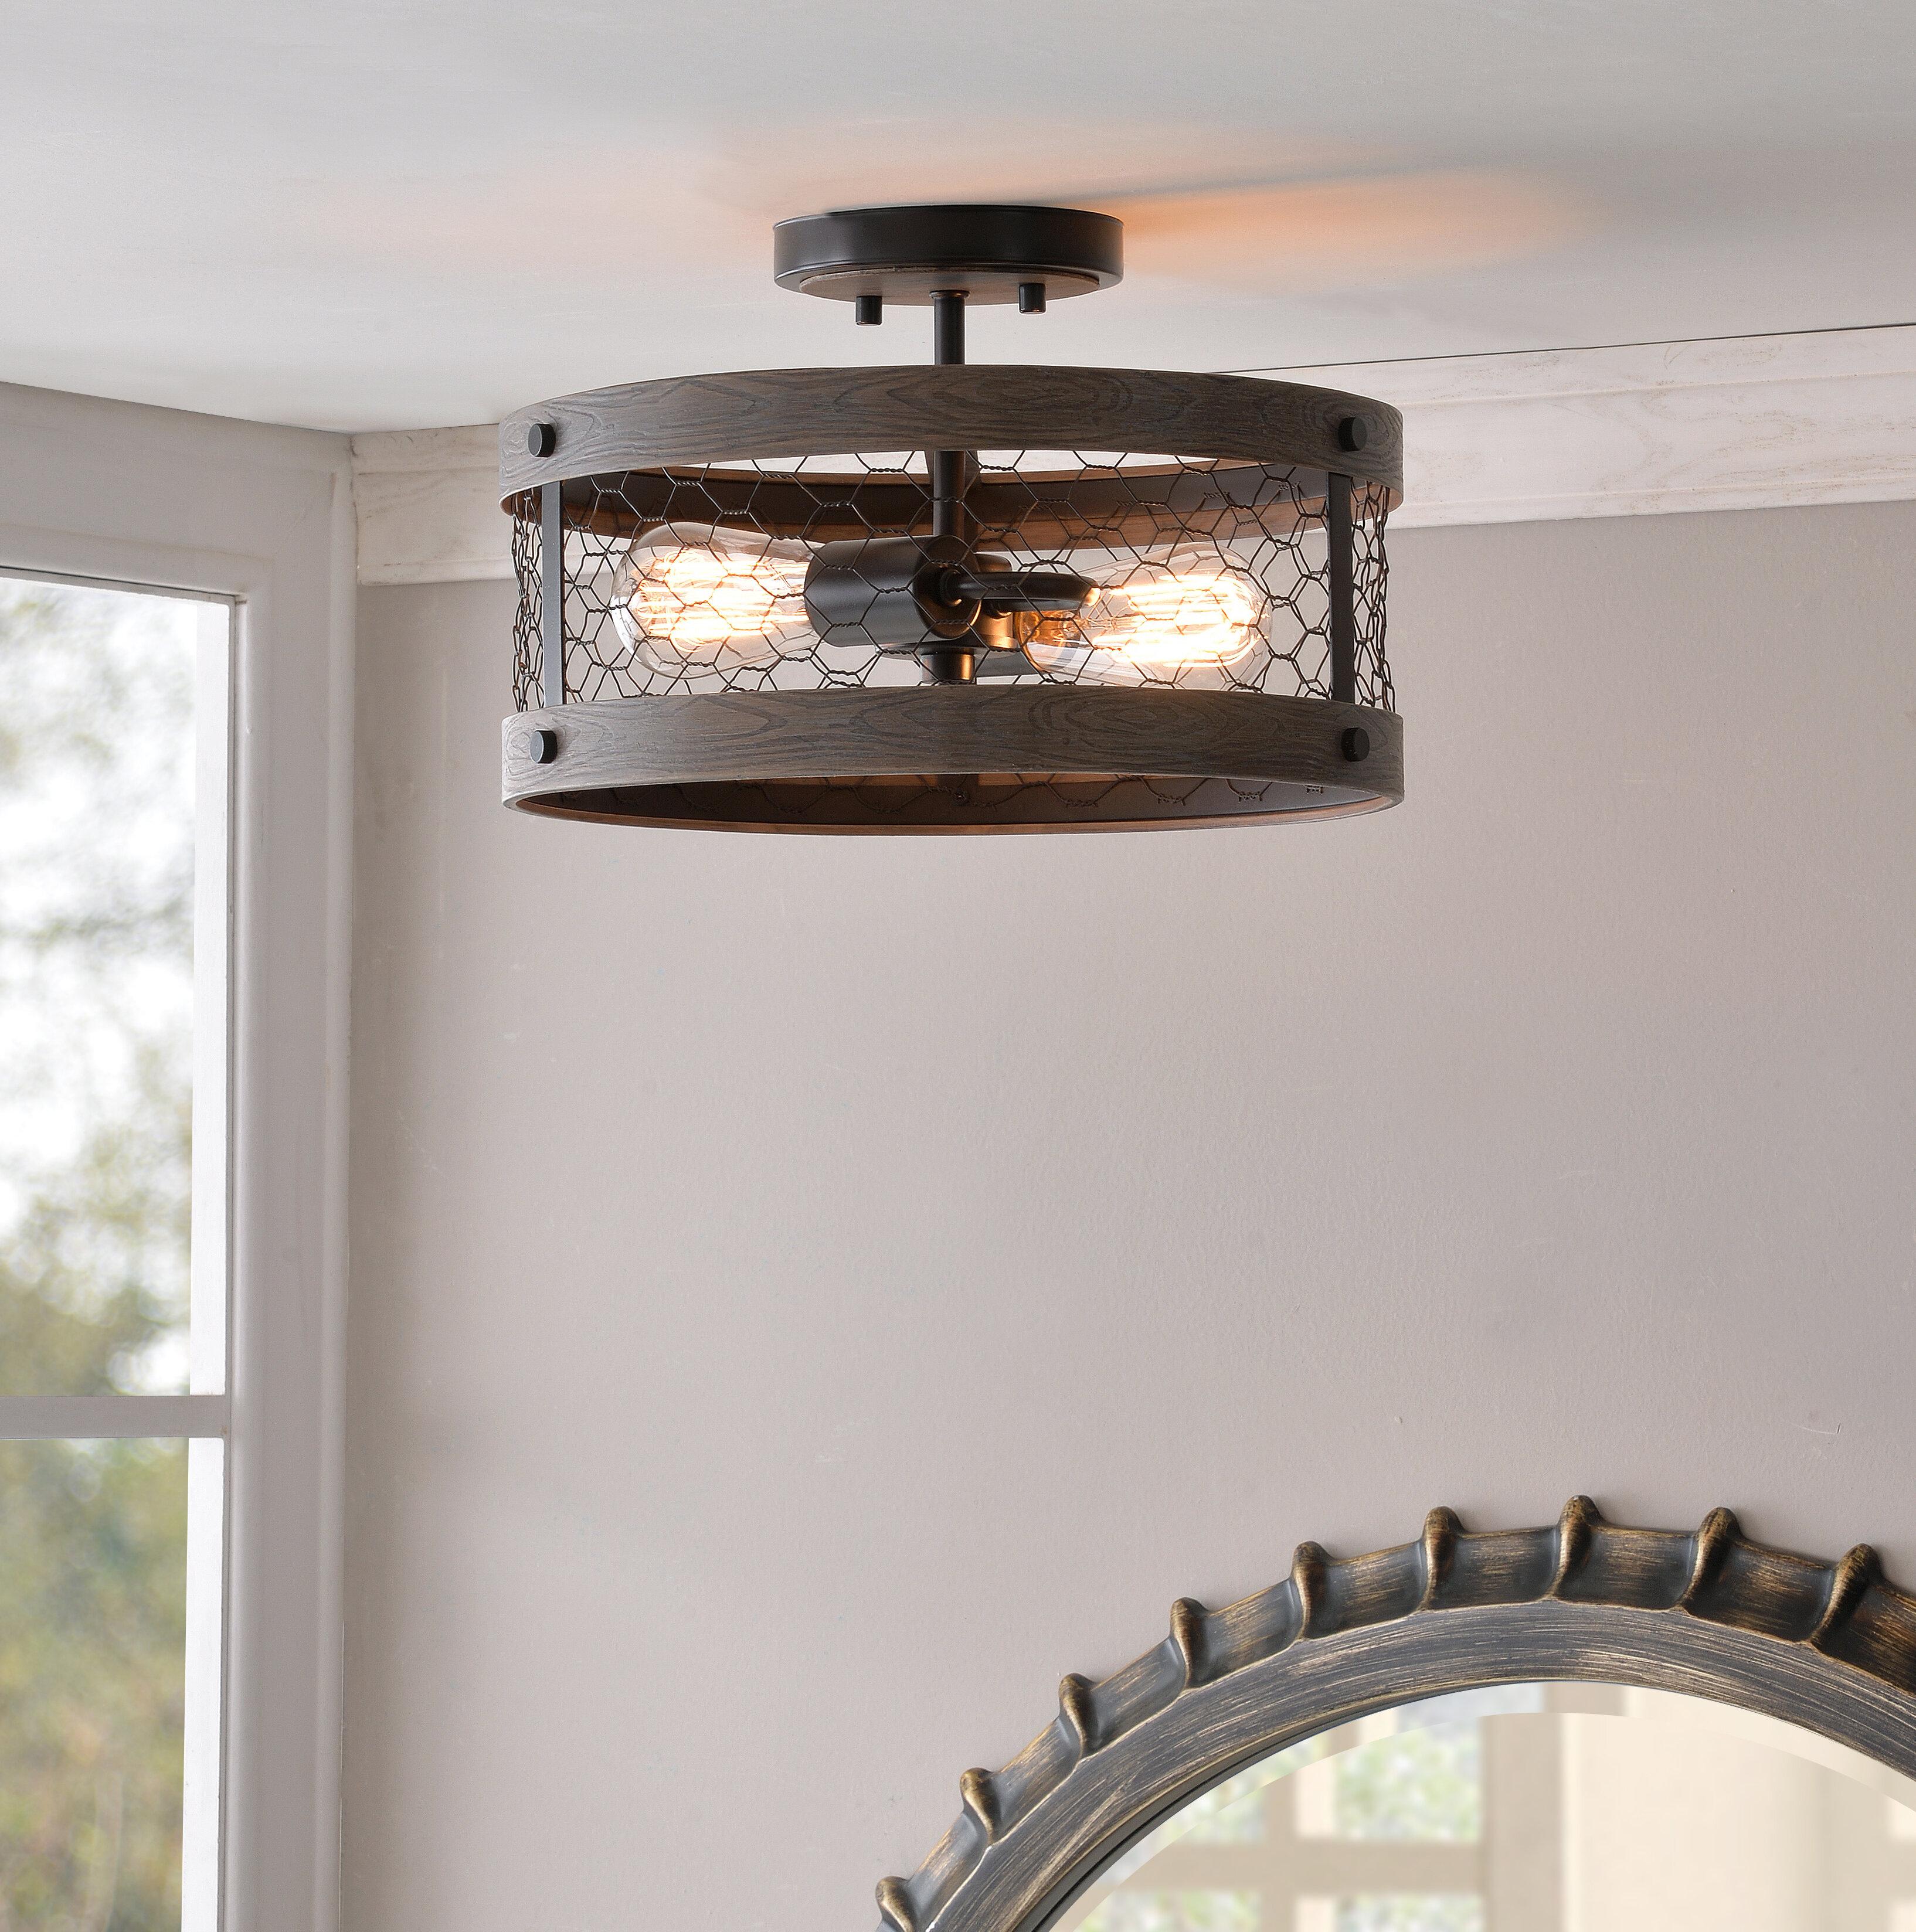 Williston Forge Kronos 2-Light Semi Flush Mount & Reviews | Wayfair